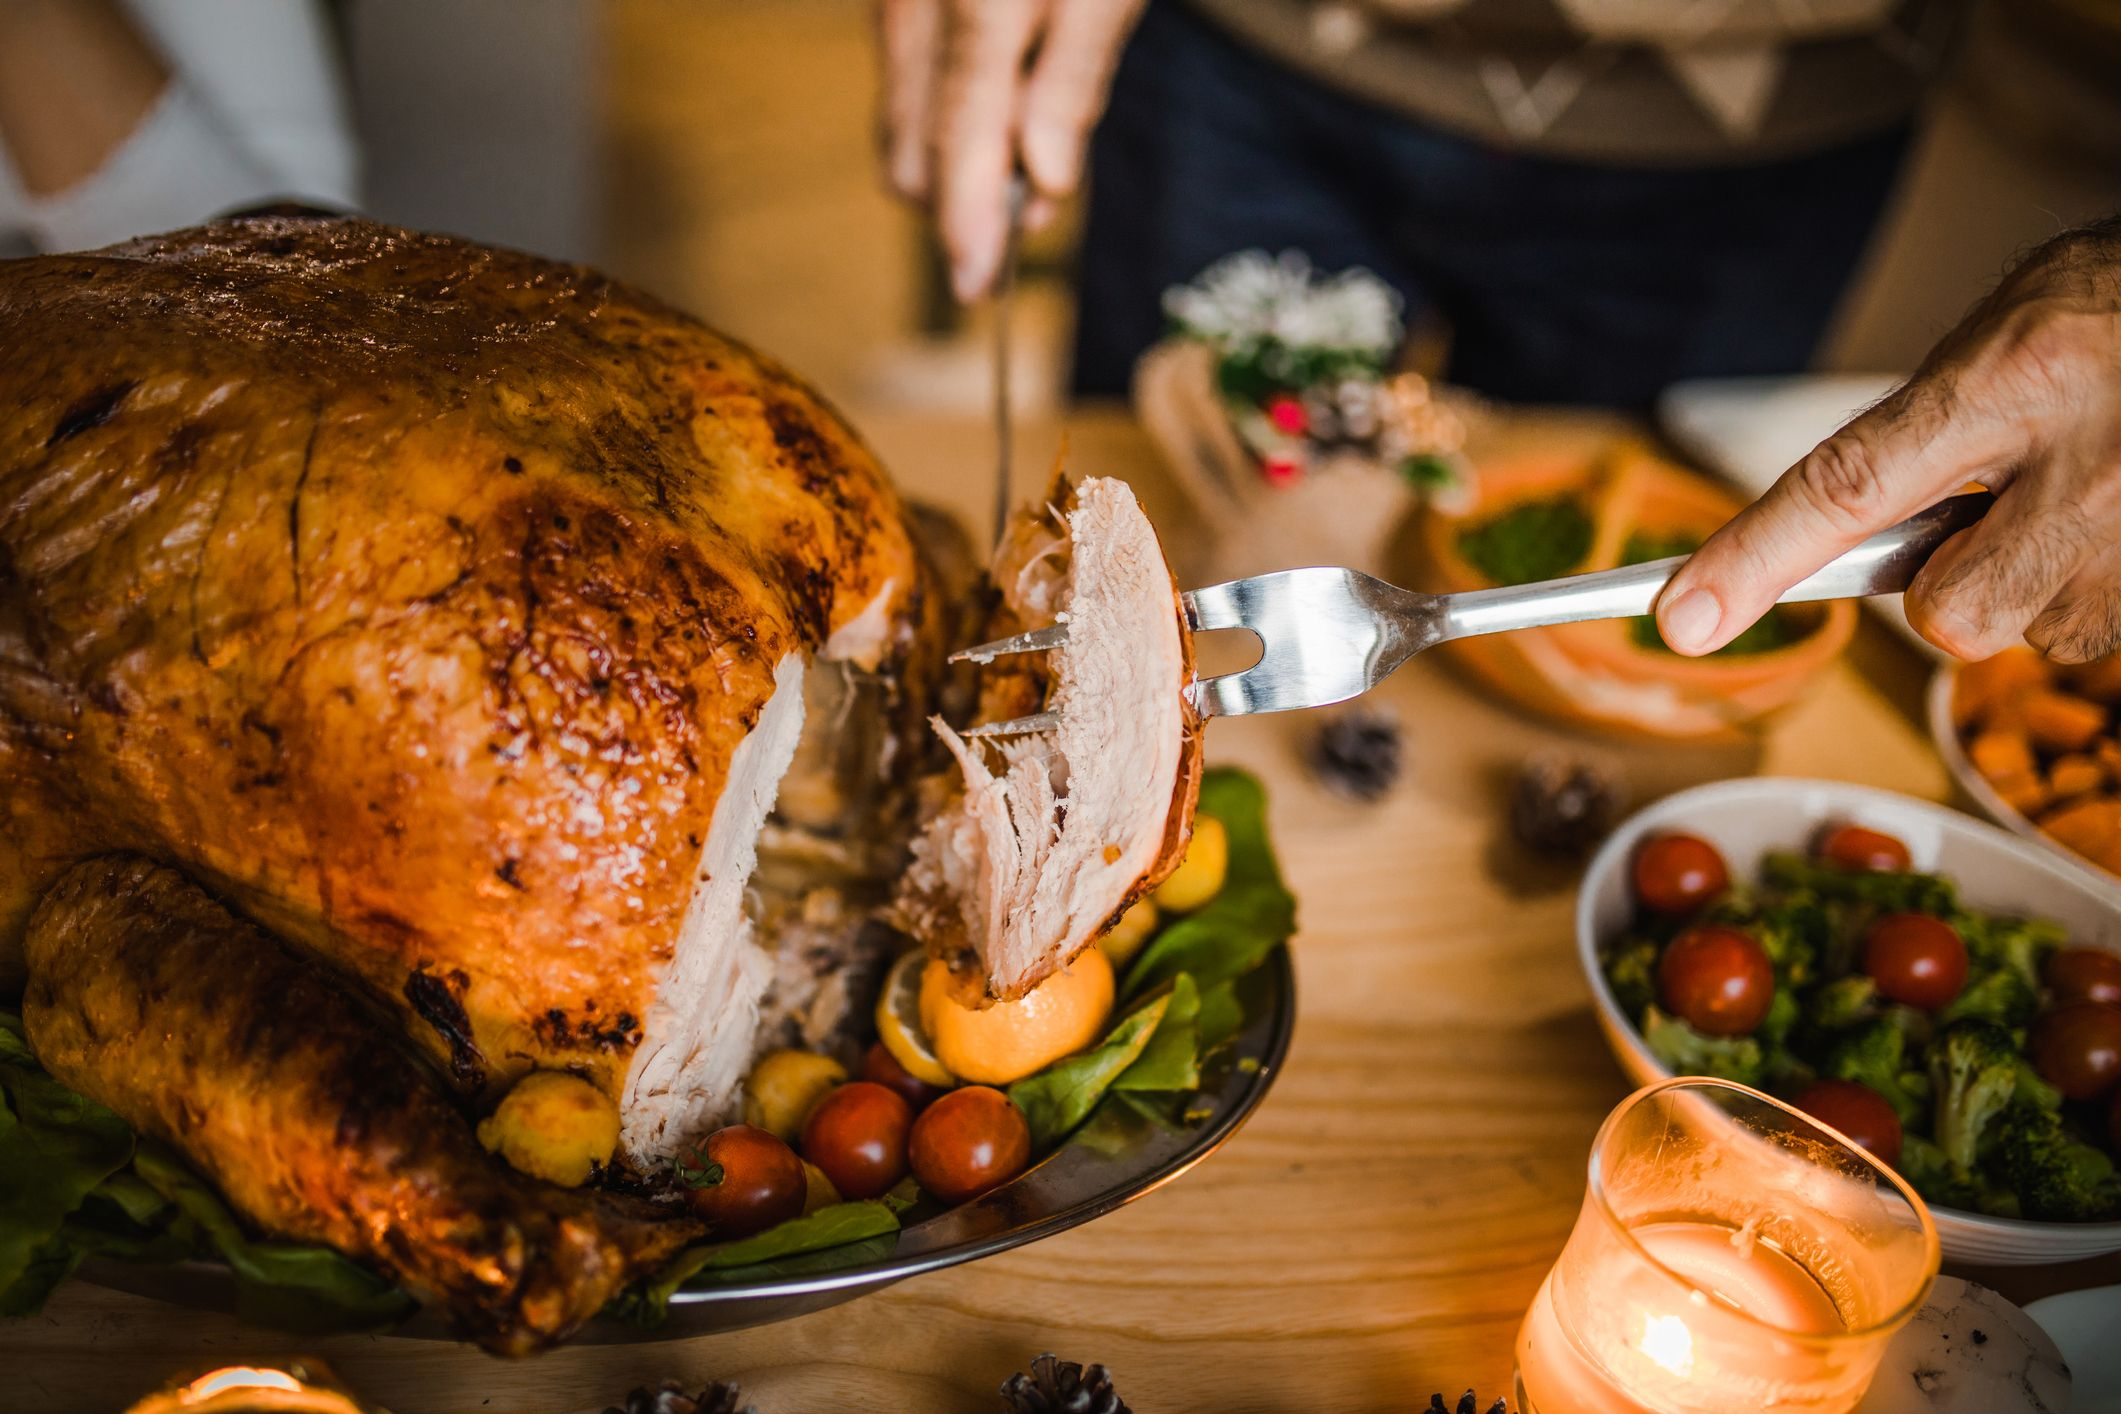 How to Properly Carve a Turkey Like a Pro